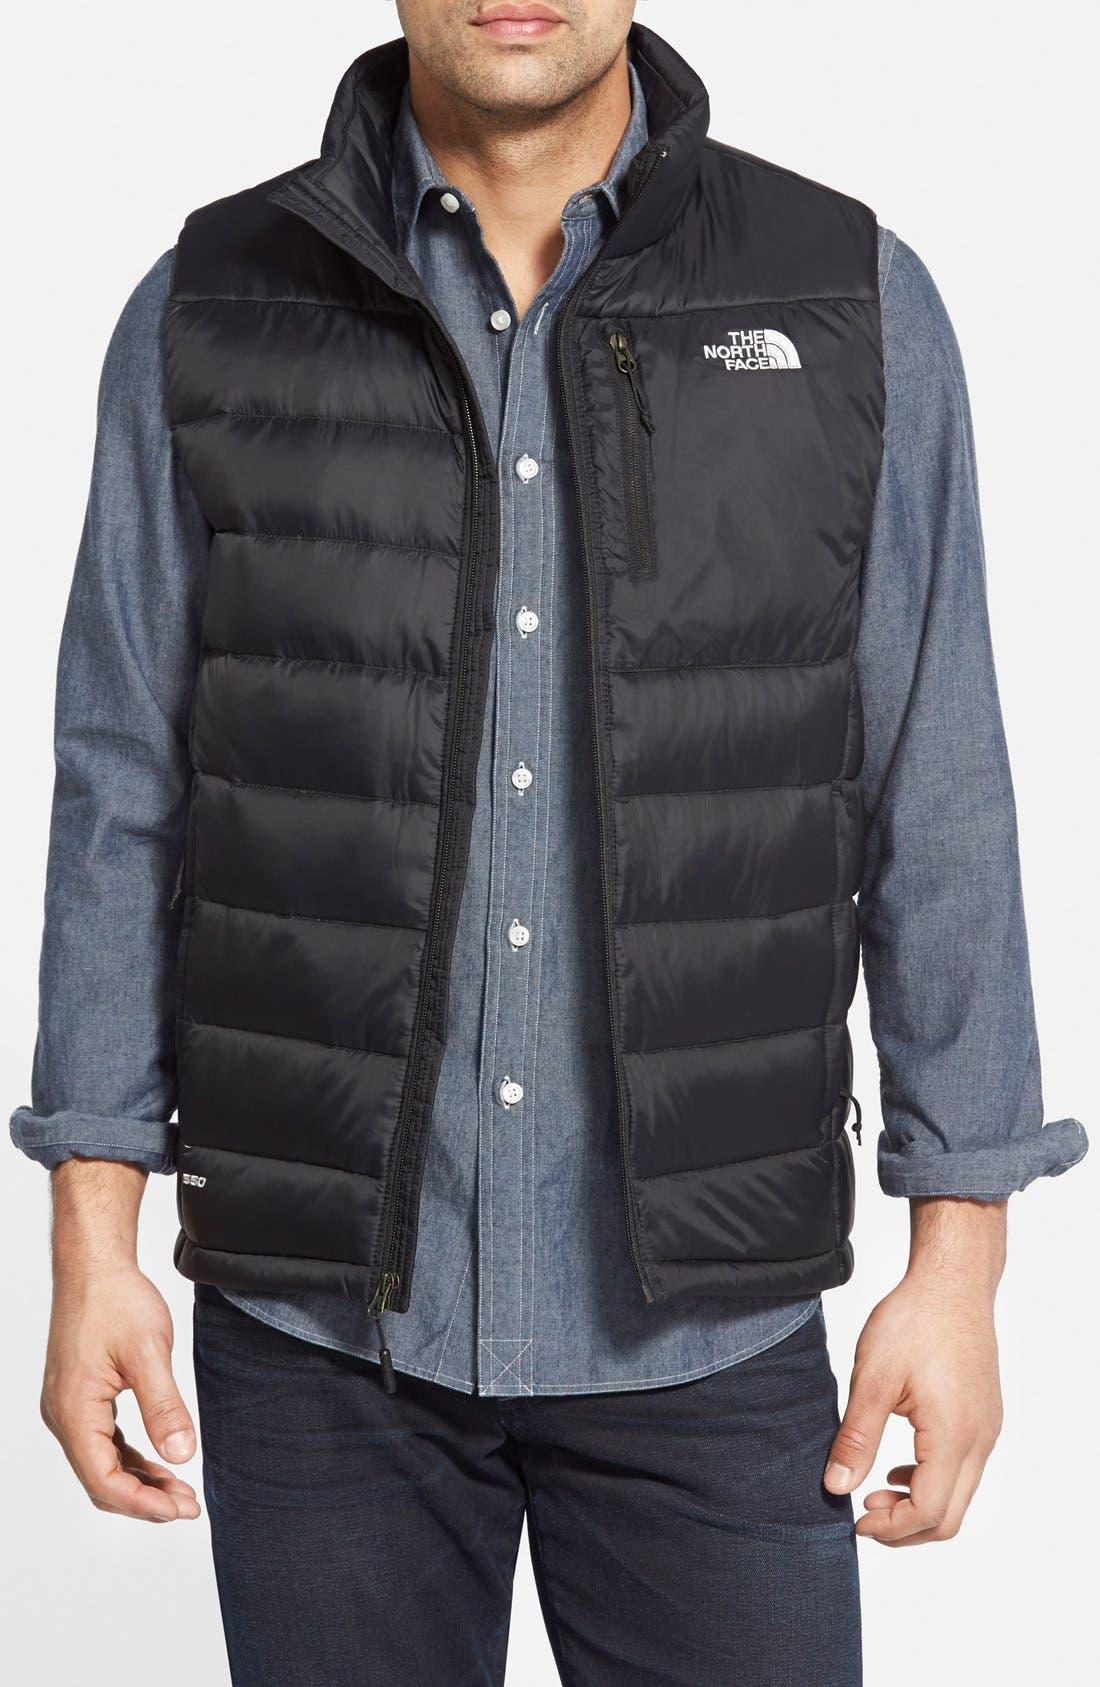 THE NORTH FACE 'Aconcagua' Goose Down Vest, Main, color, 001